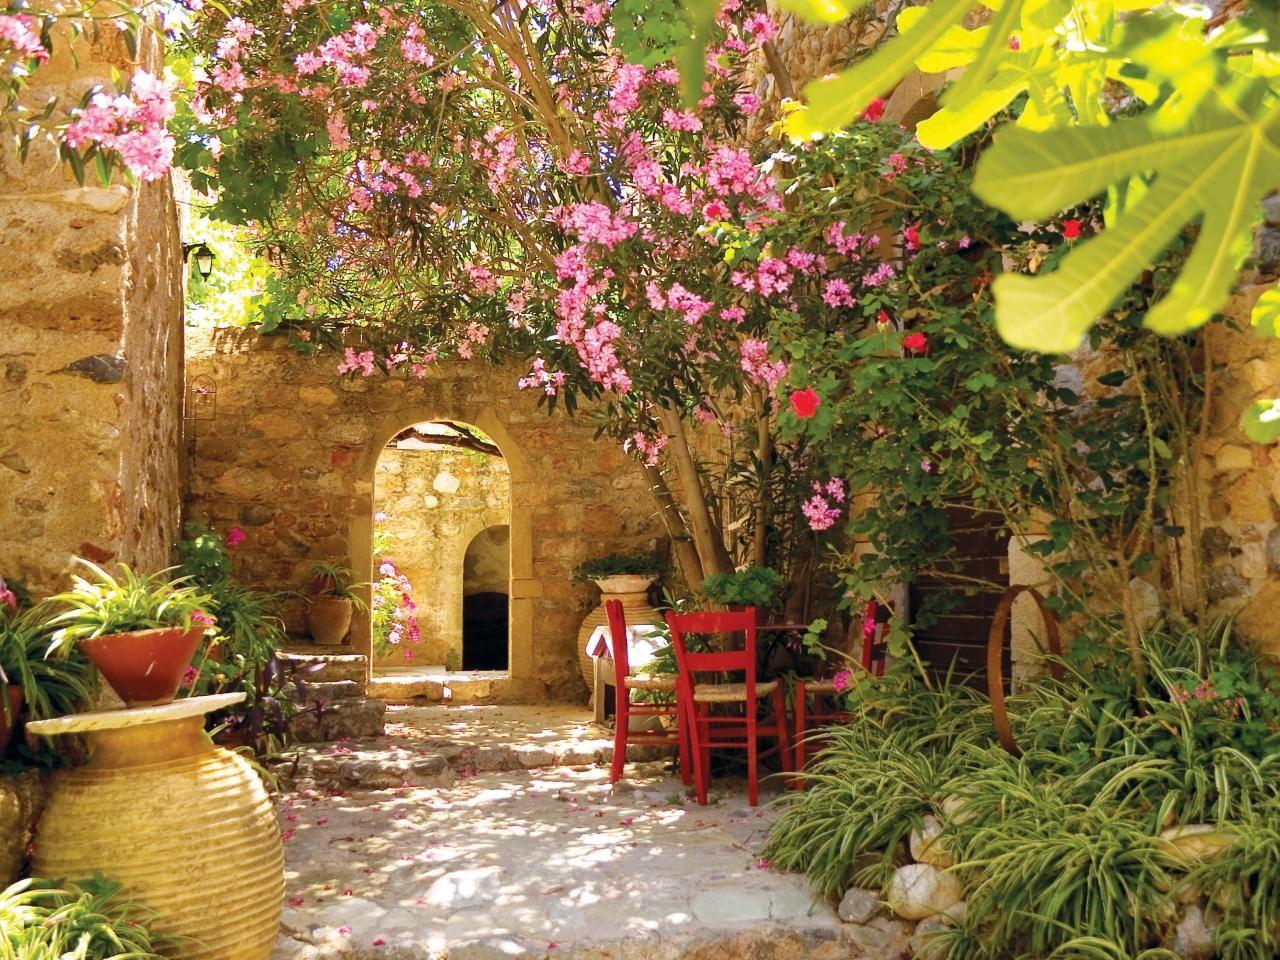 greek courtyard garden - Bing Images | Garden designs | Pinterest ...